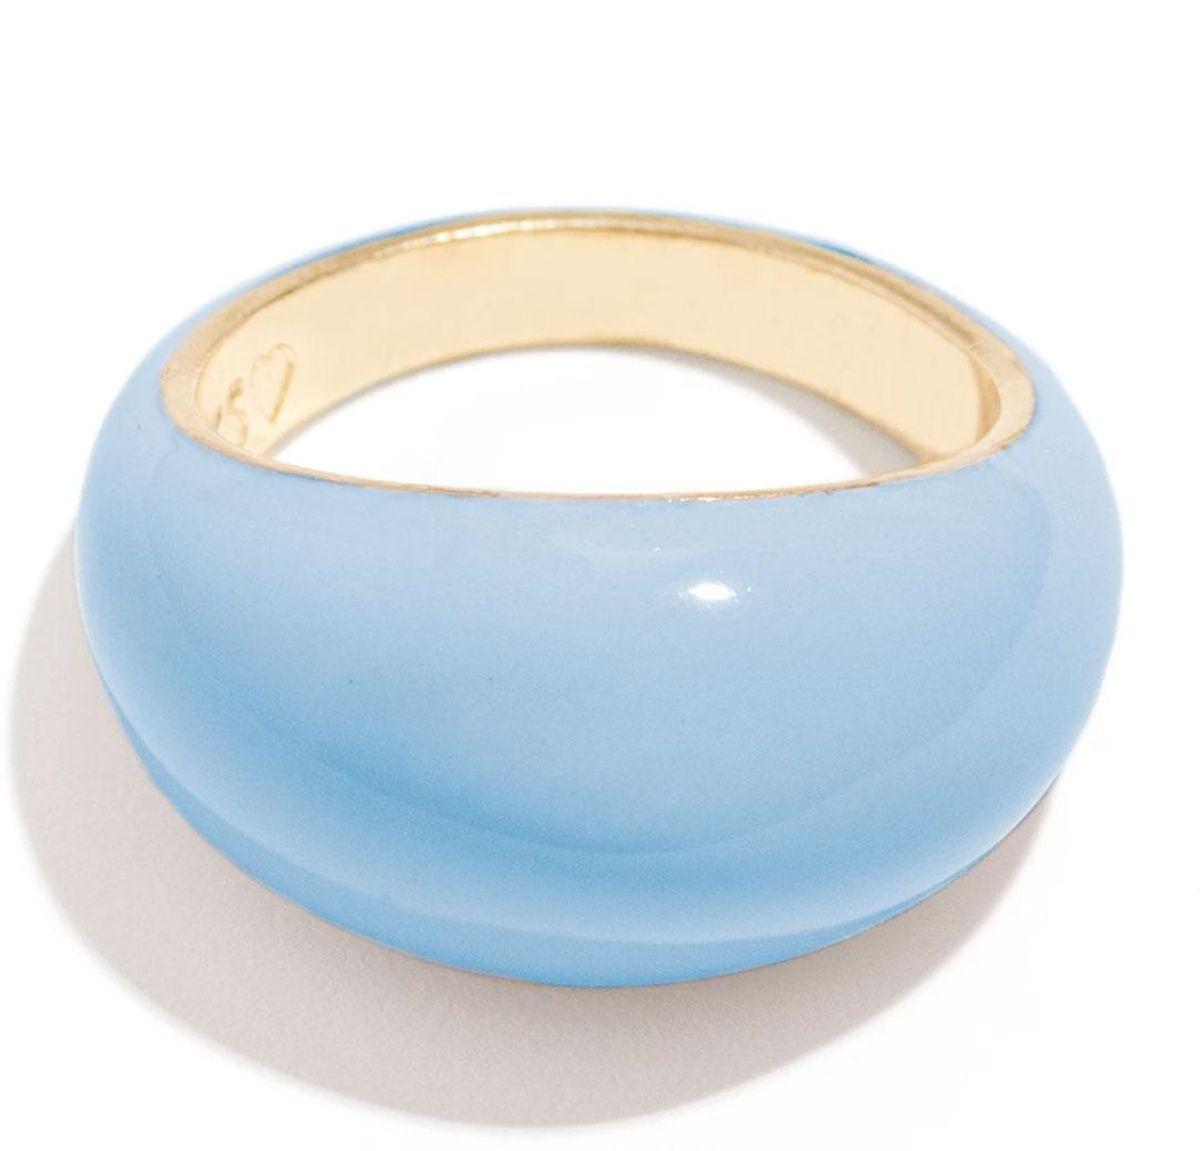 frasier sterling candy enamel ring in powder blue